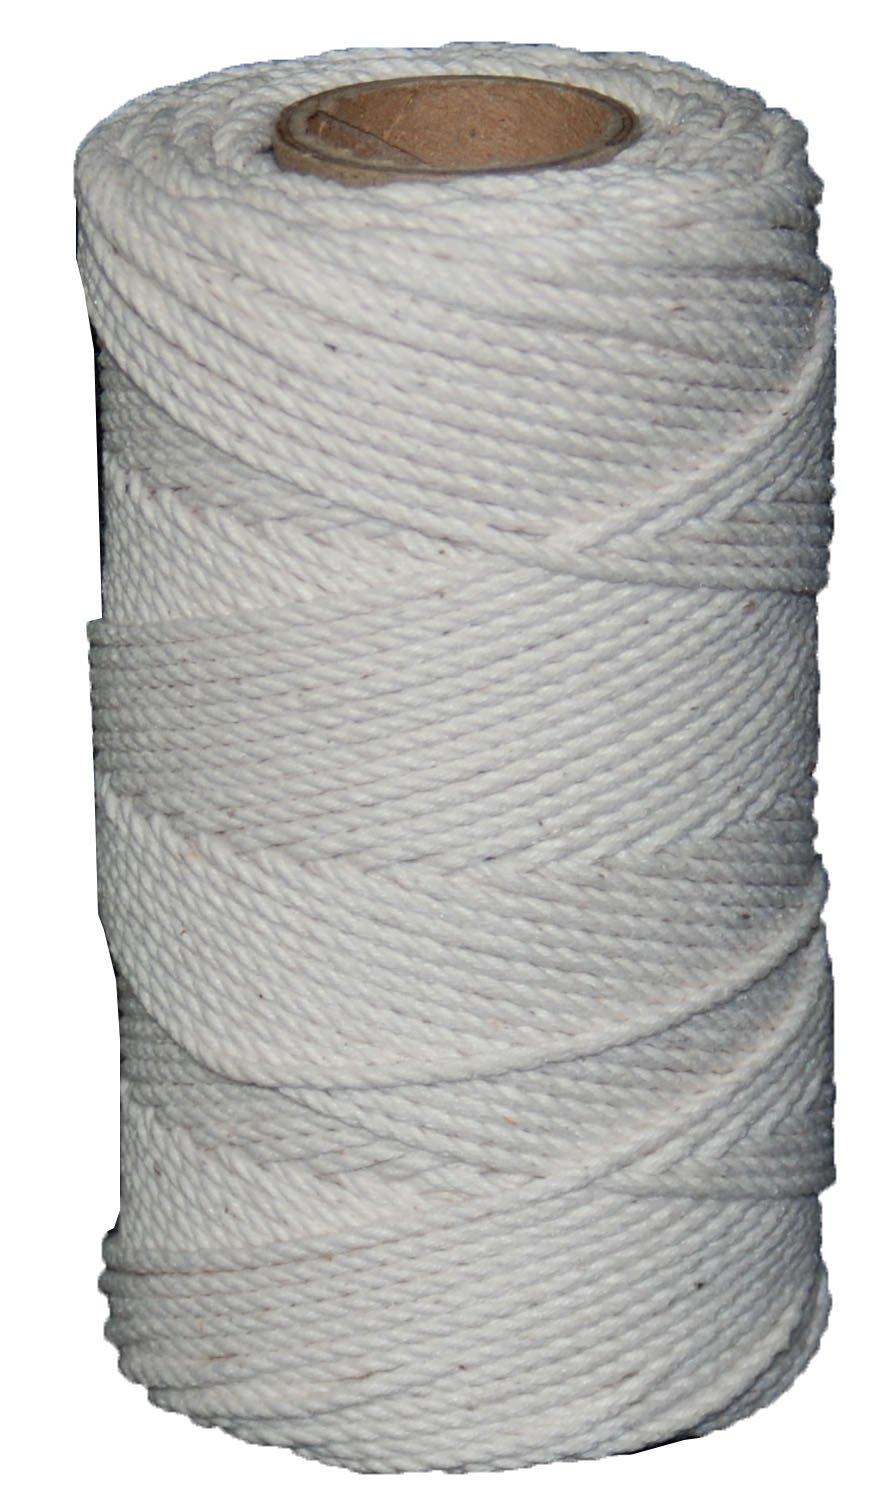 T.W . Evans Cordage 02-182 Number-18 Cotton Seine Mason Line with 275-Feet Tube